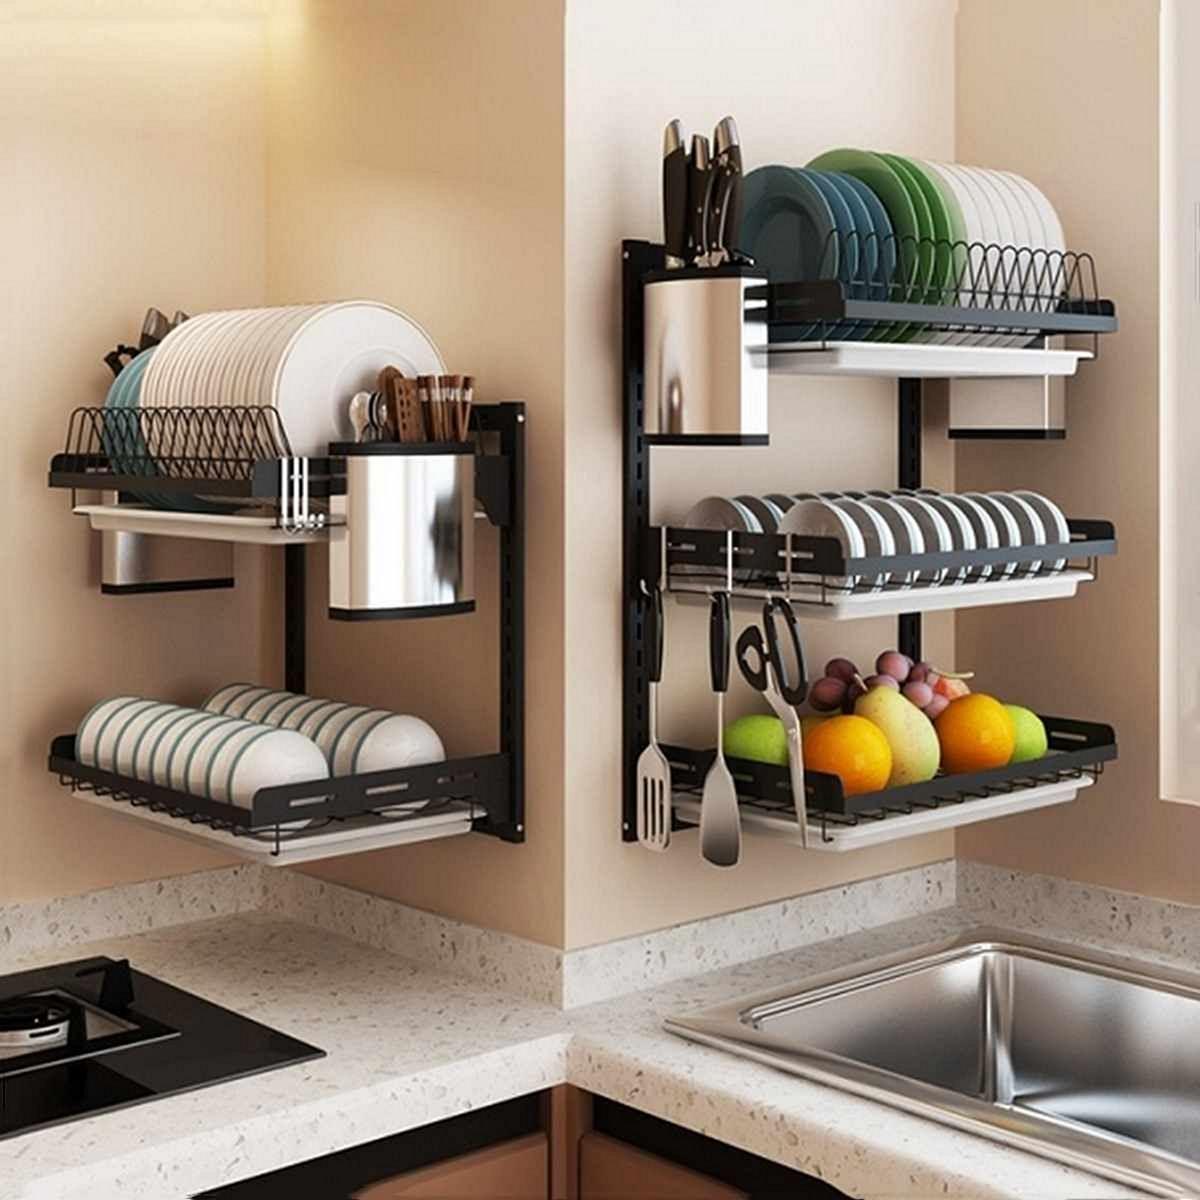 Wonderful Stainless Kitchen Rack Ideas